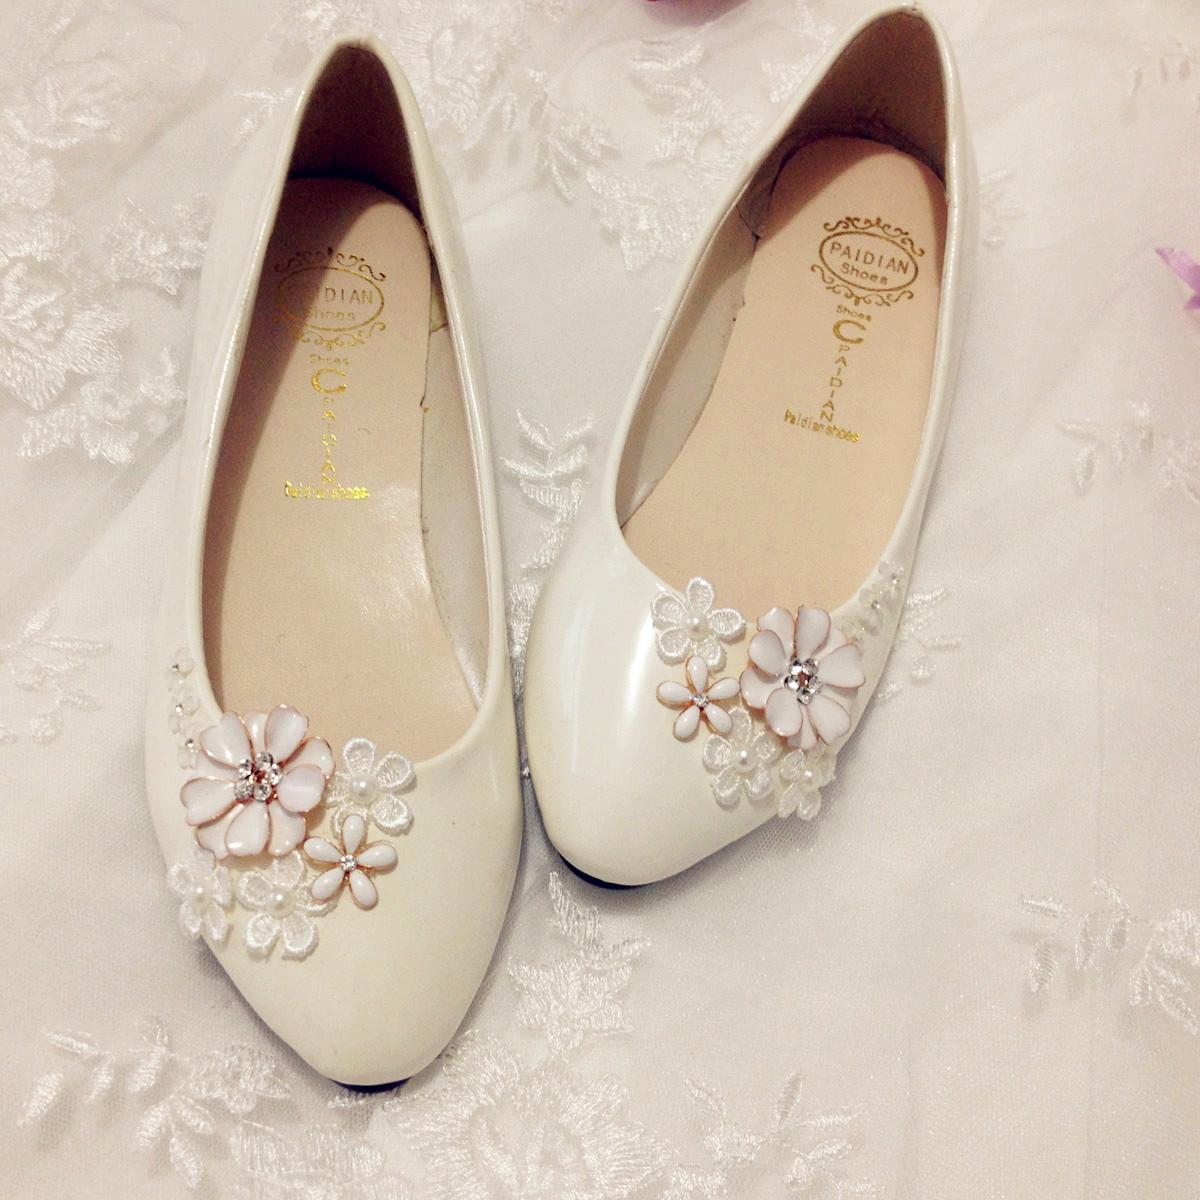 White Flat Wedding Shoes Promotion Online Shopping For Promotional White Flat Wedding Shoes On